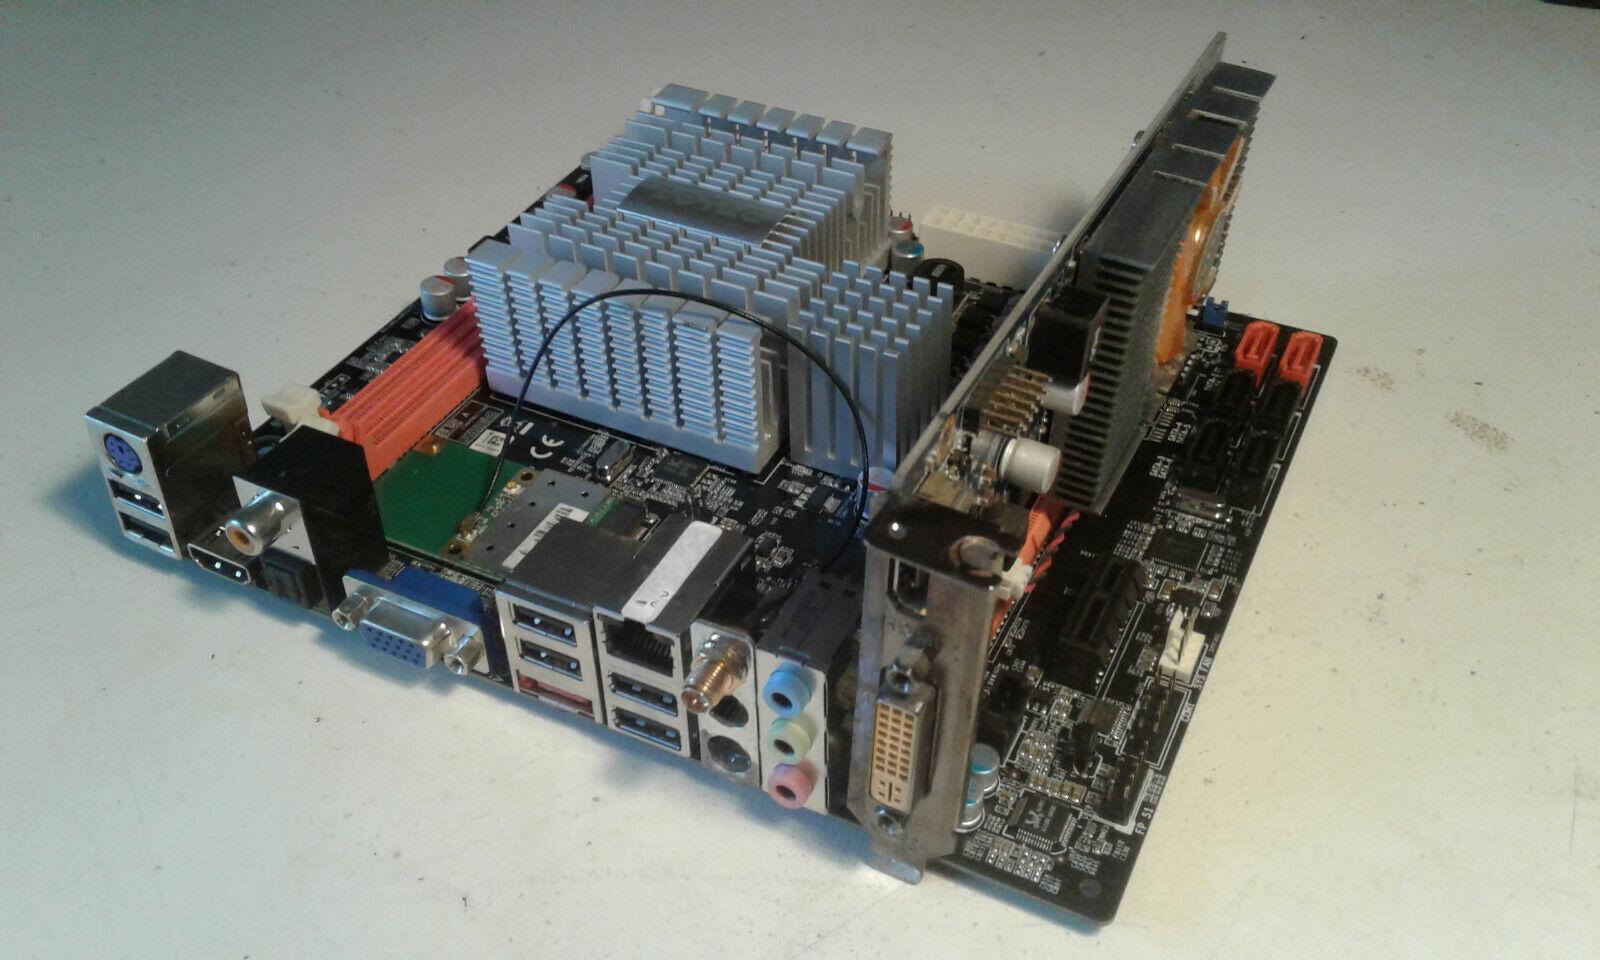 Mainboard ZOTAC NM10 DTX WIFI (defekt!), RAM 4GB, Grafikkarte GT218 ION 512MB